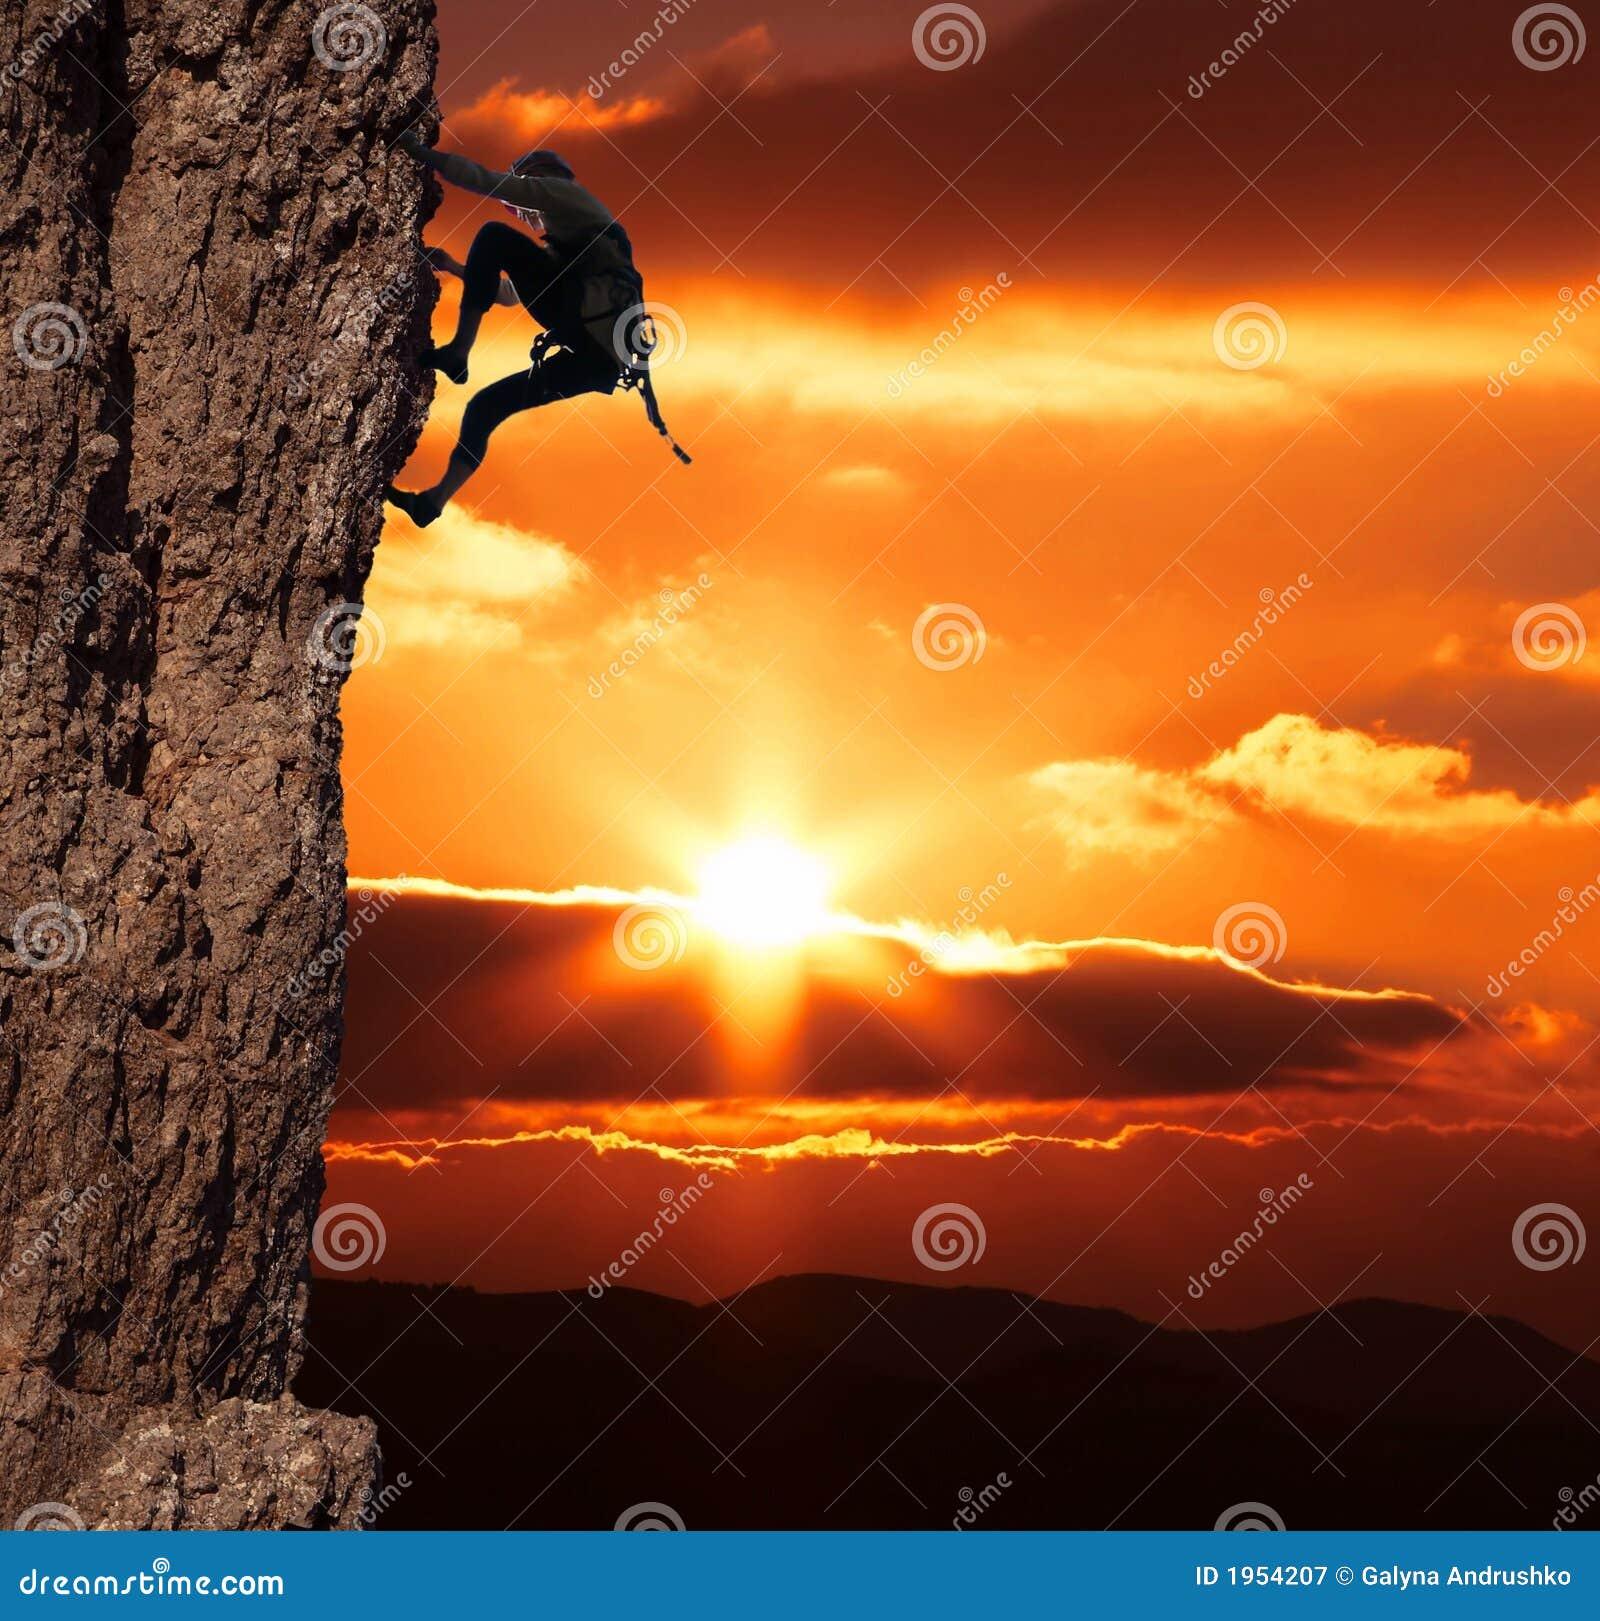 Climber on sanset